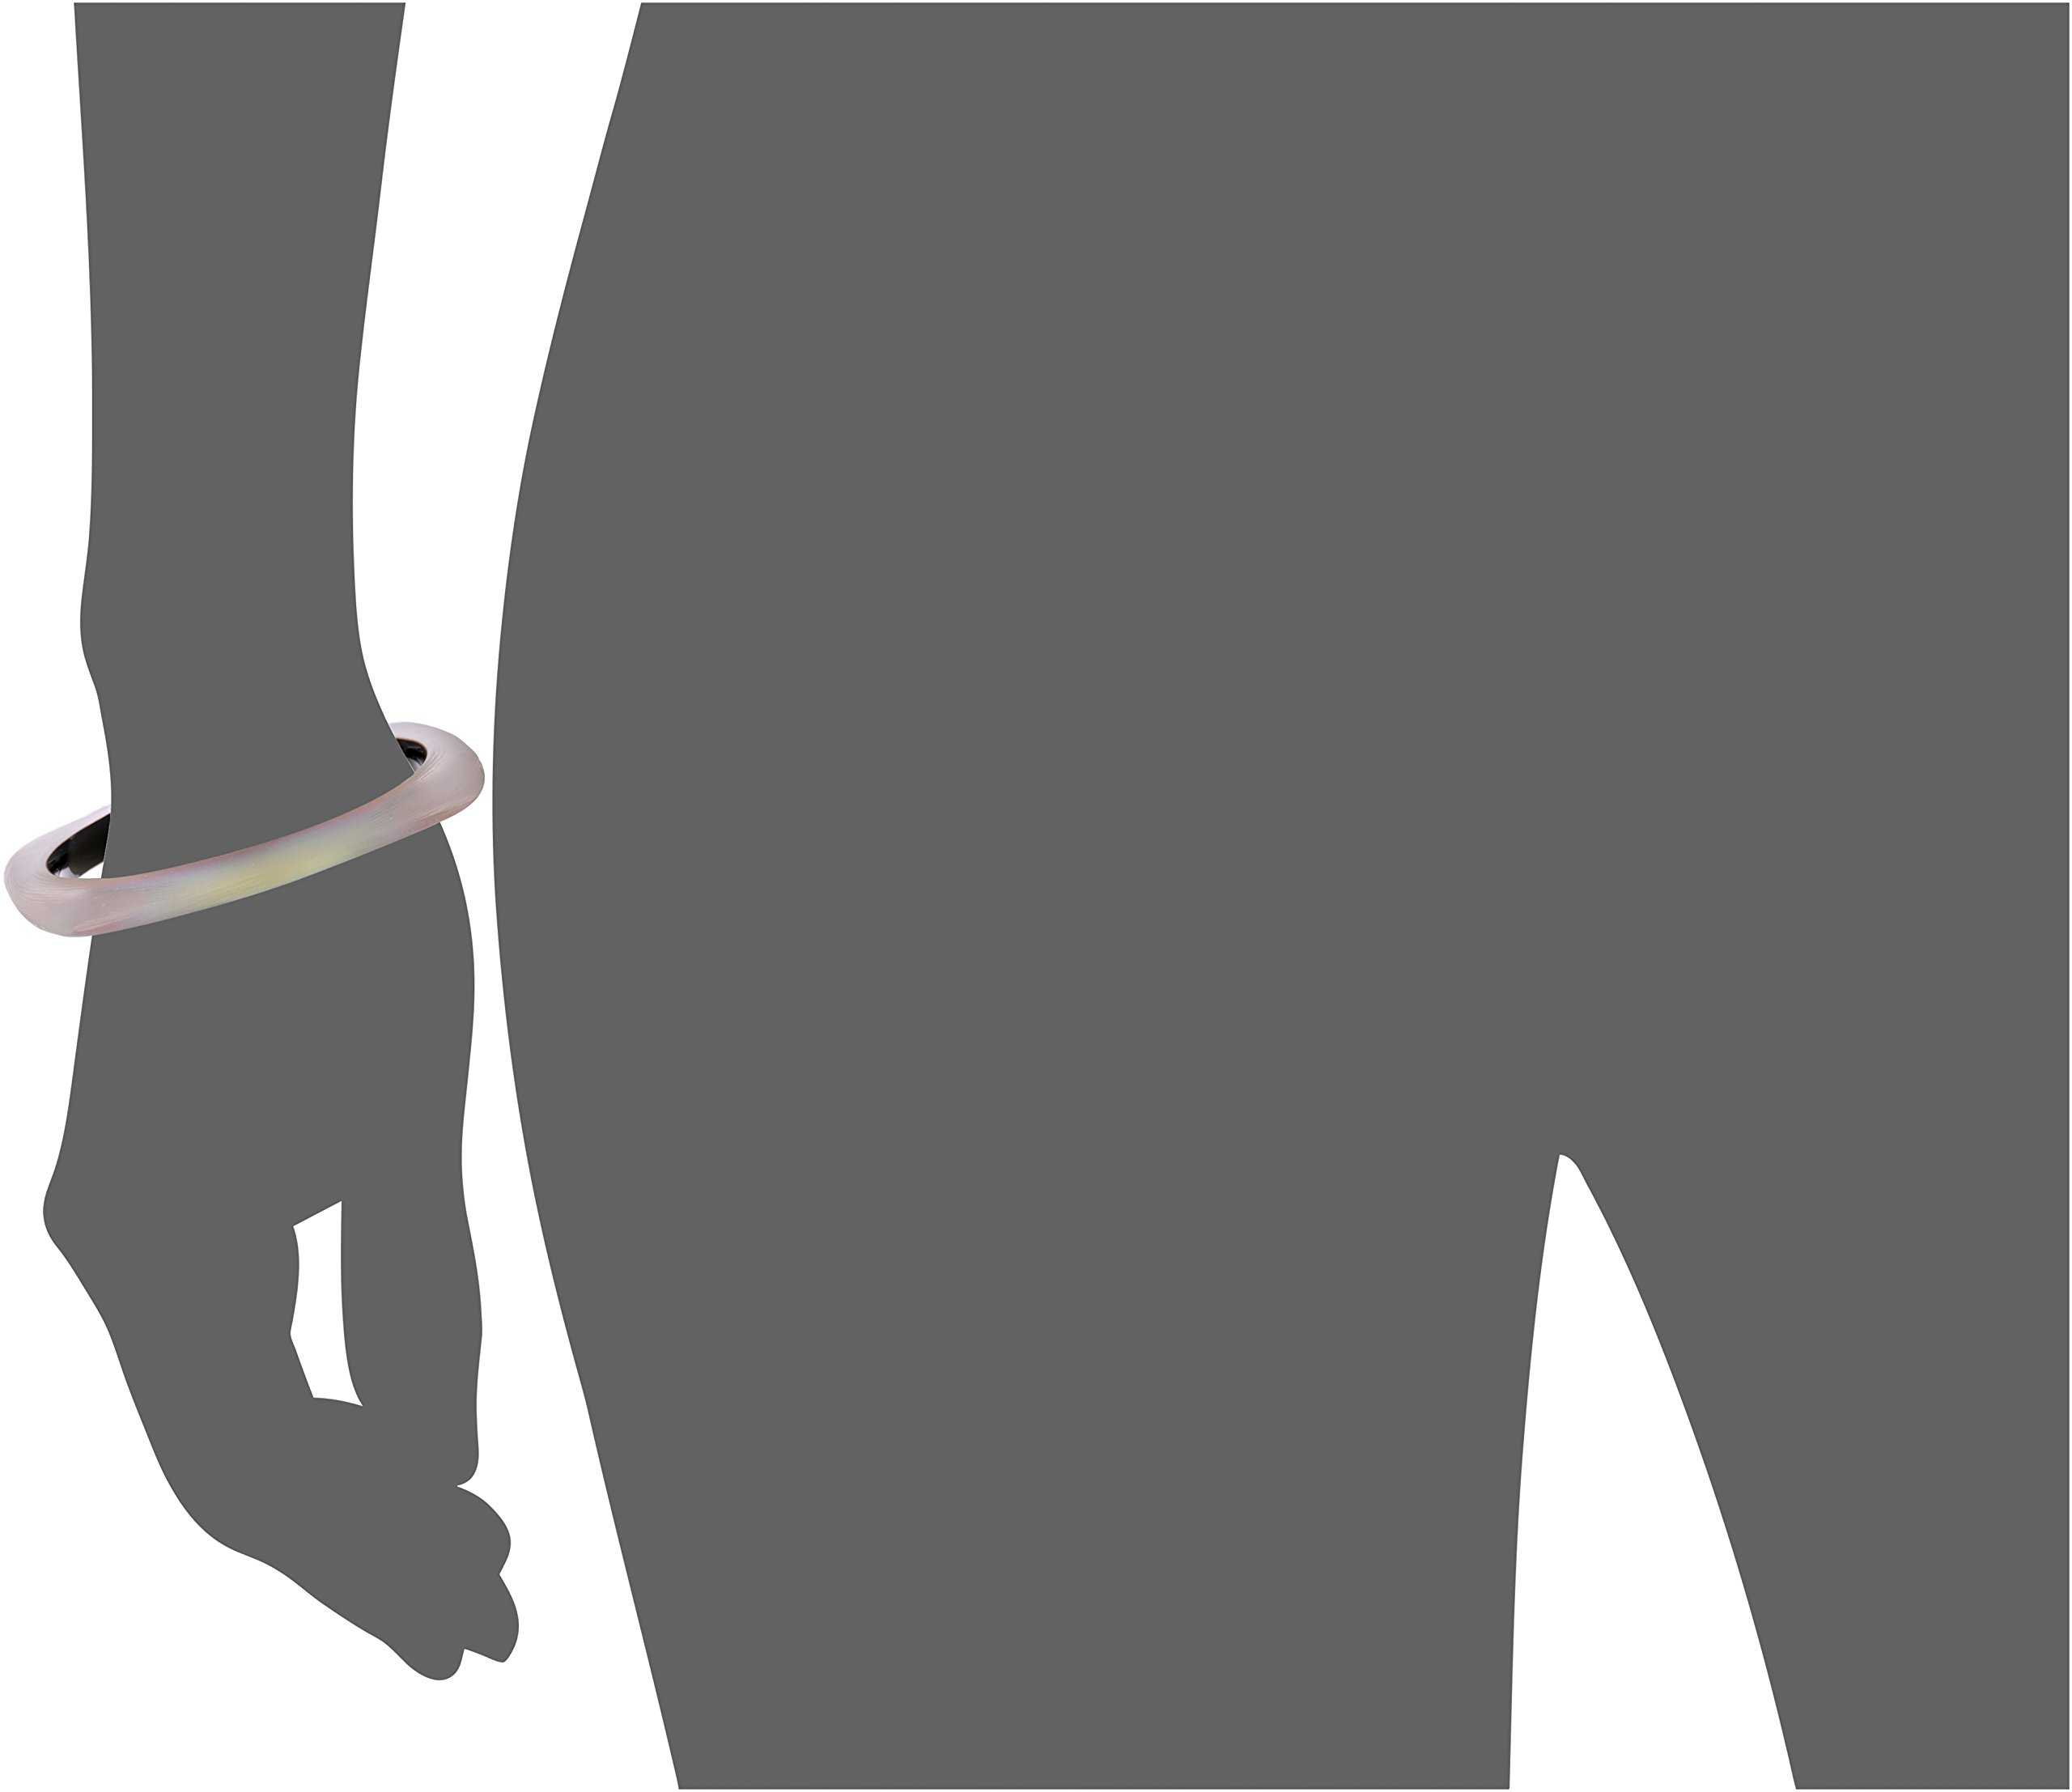 Alexis Bittar Soft Square Cuff Bracelet Bangle, New Labradorite, One Size by Alexis Bittar (Image #2)